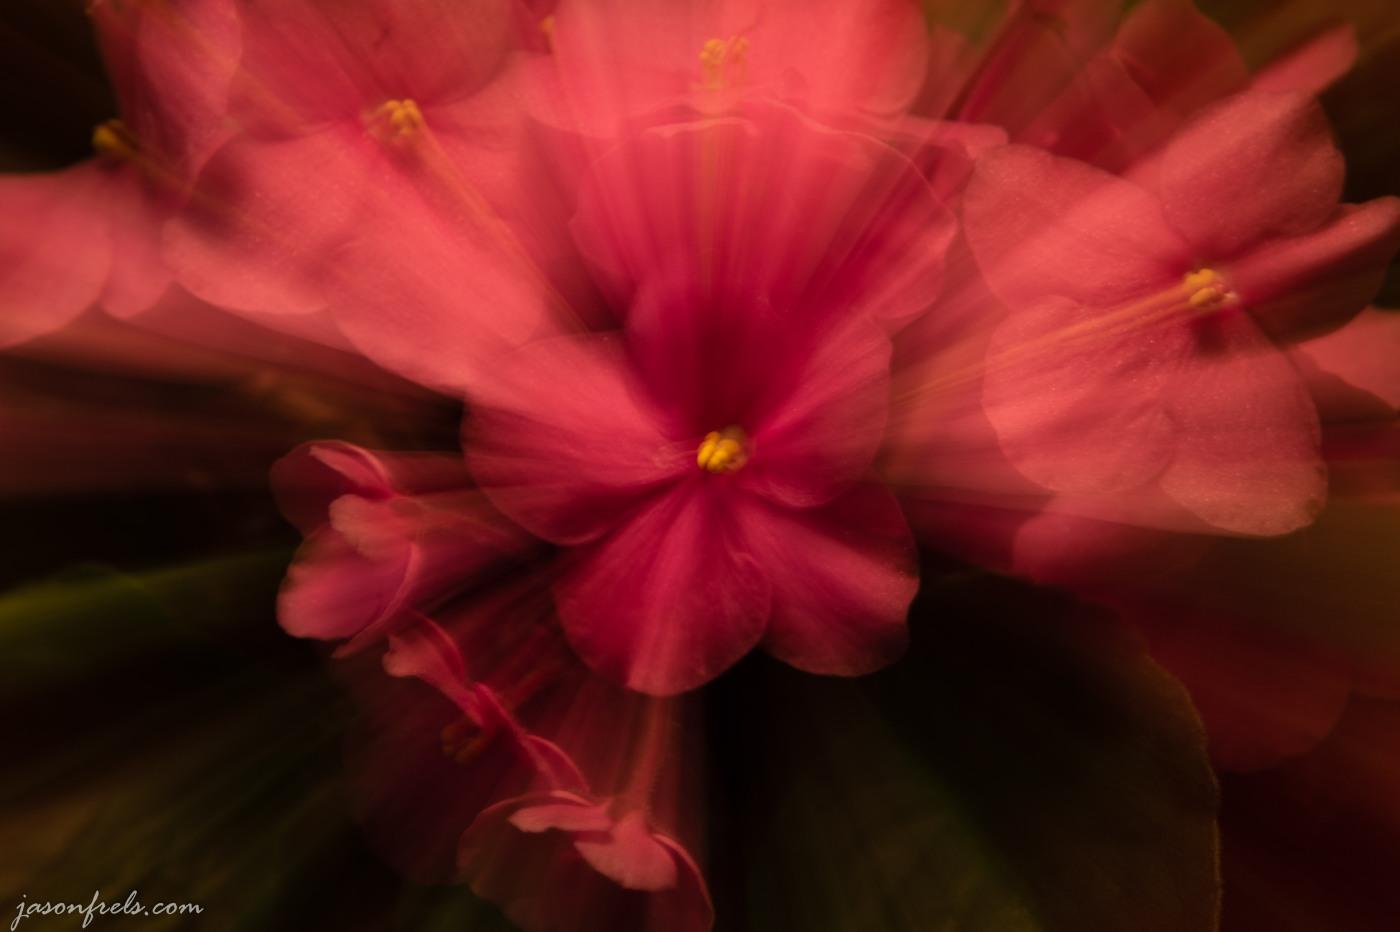 Zoom burst effect on flowers